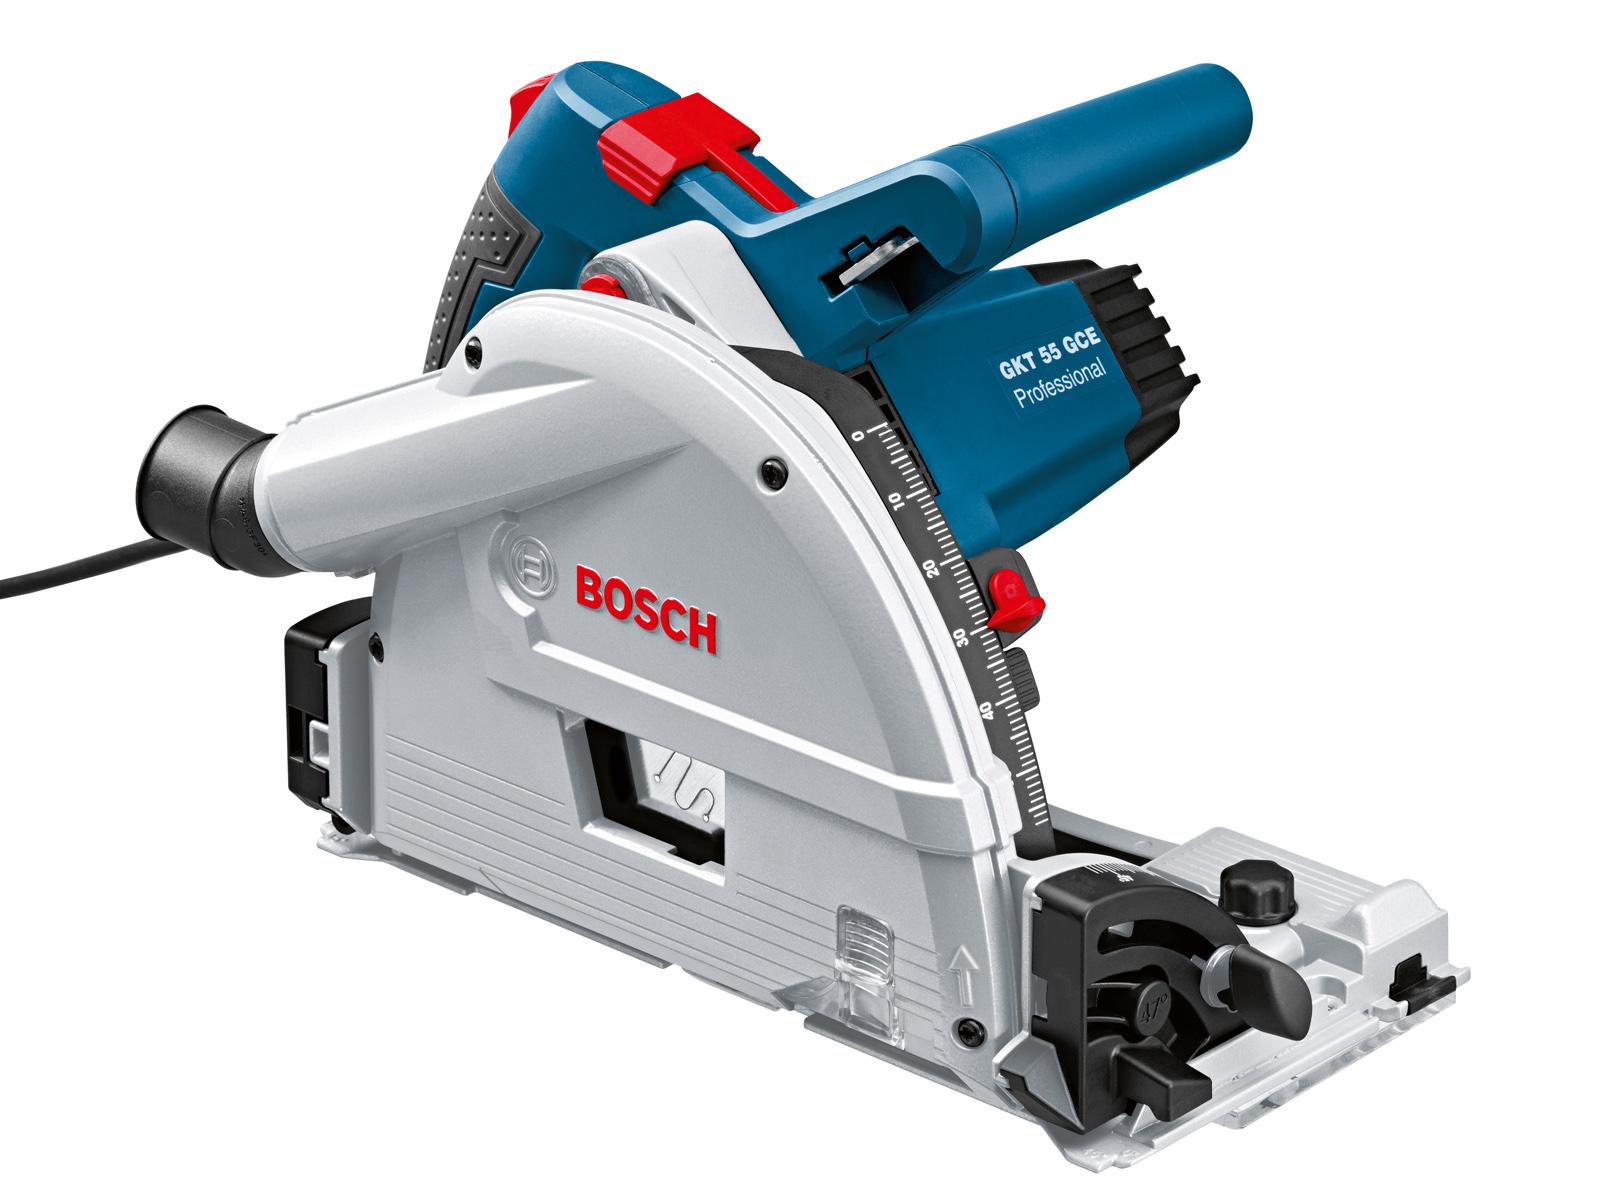 Погружная циркулярная пила Bosch Gkt 55 gce l-boxx (0.601.675.001) пила bosch gks 55 gce 0601682100